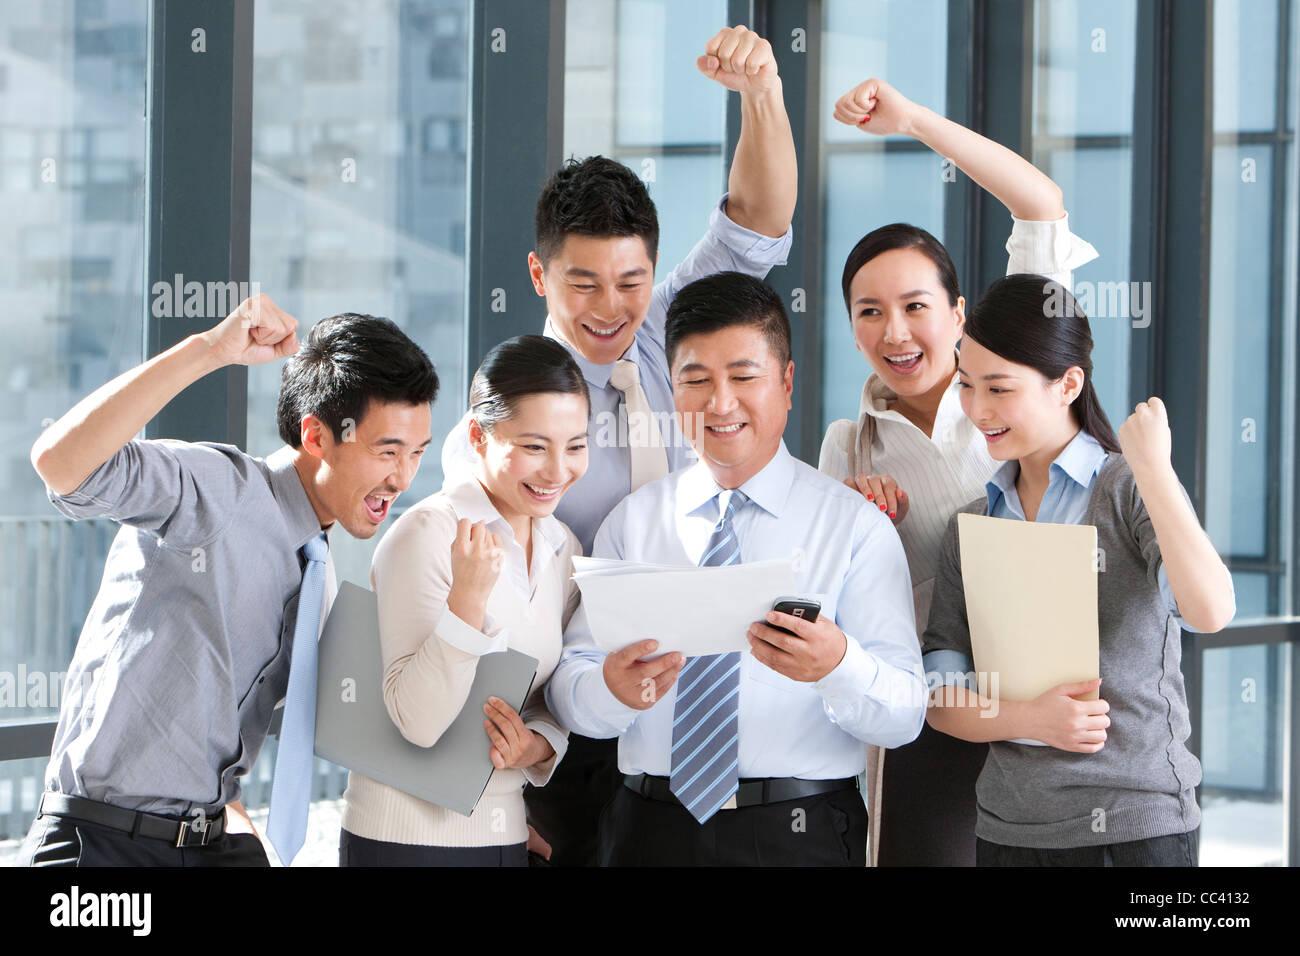 Businesspeople cheering over good news - Stock Image